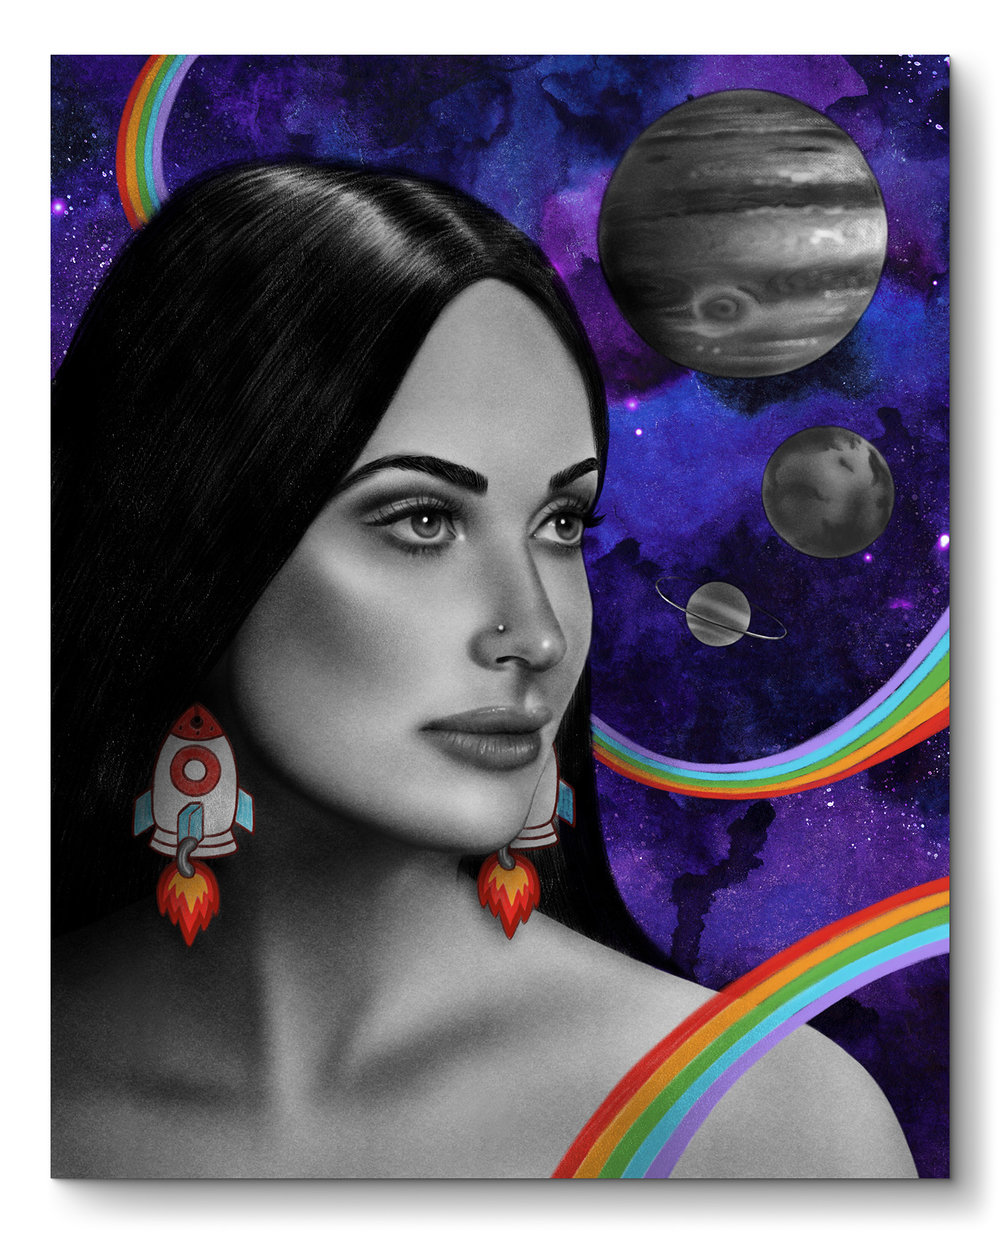 Illustration_SpaceyKacey.jpg